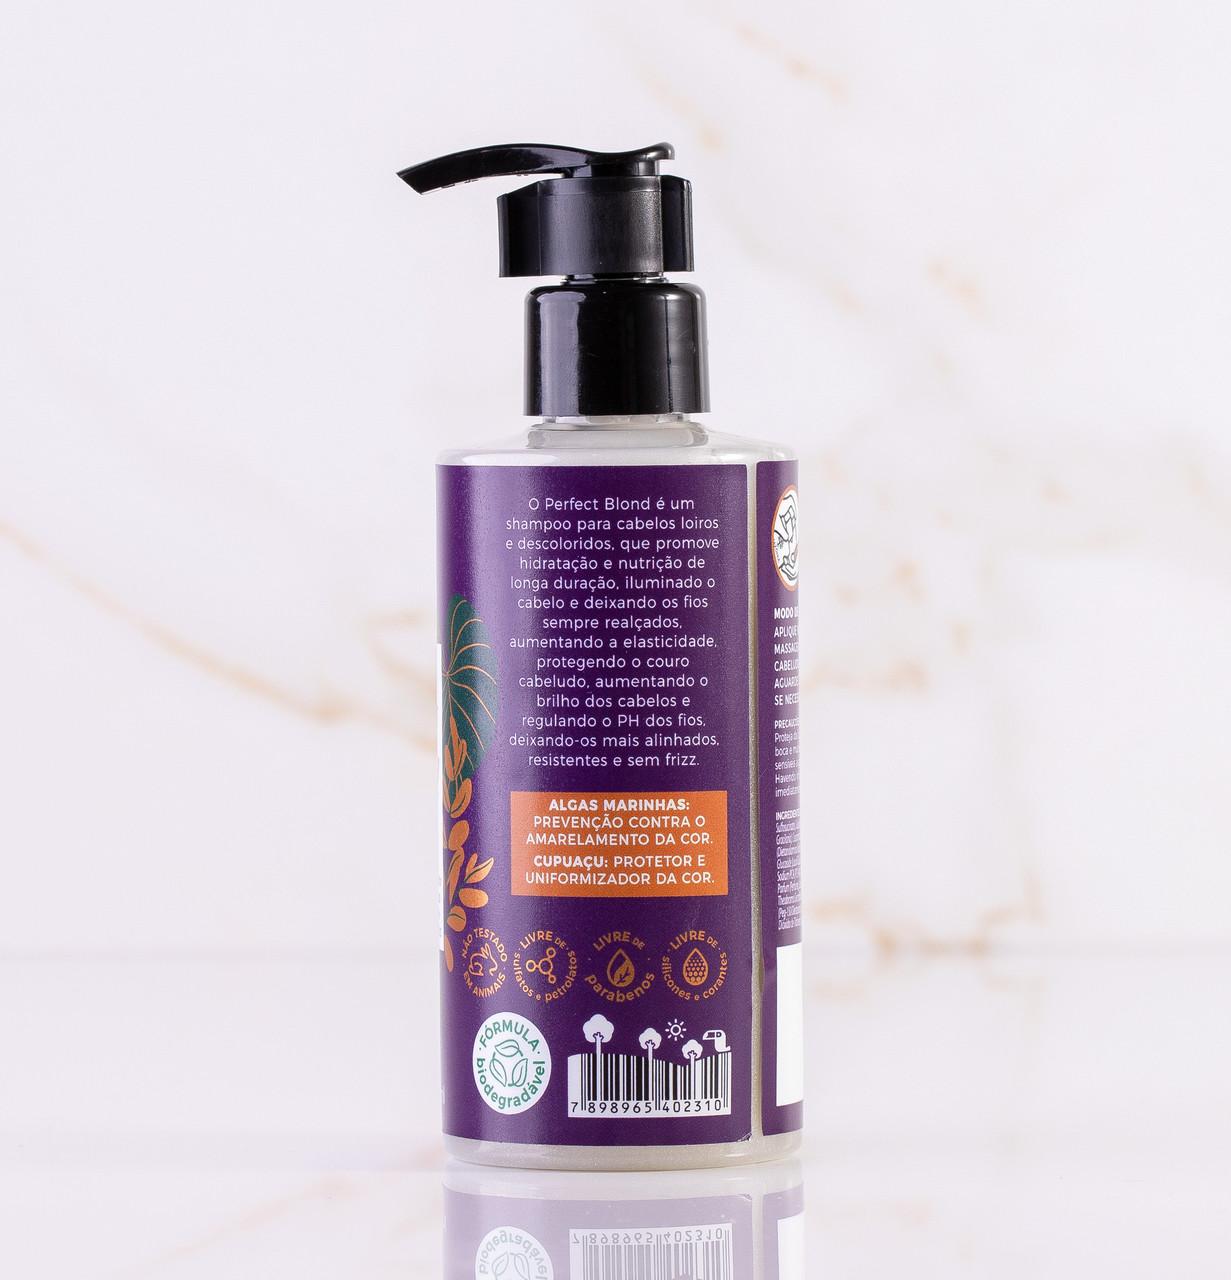 Shampoo Perfect Blond